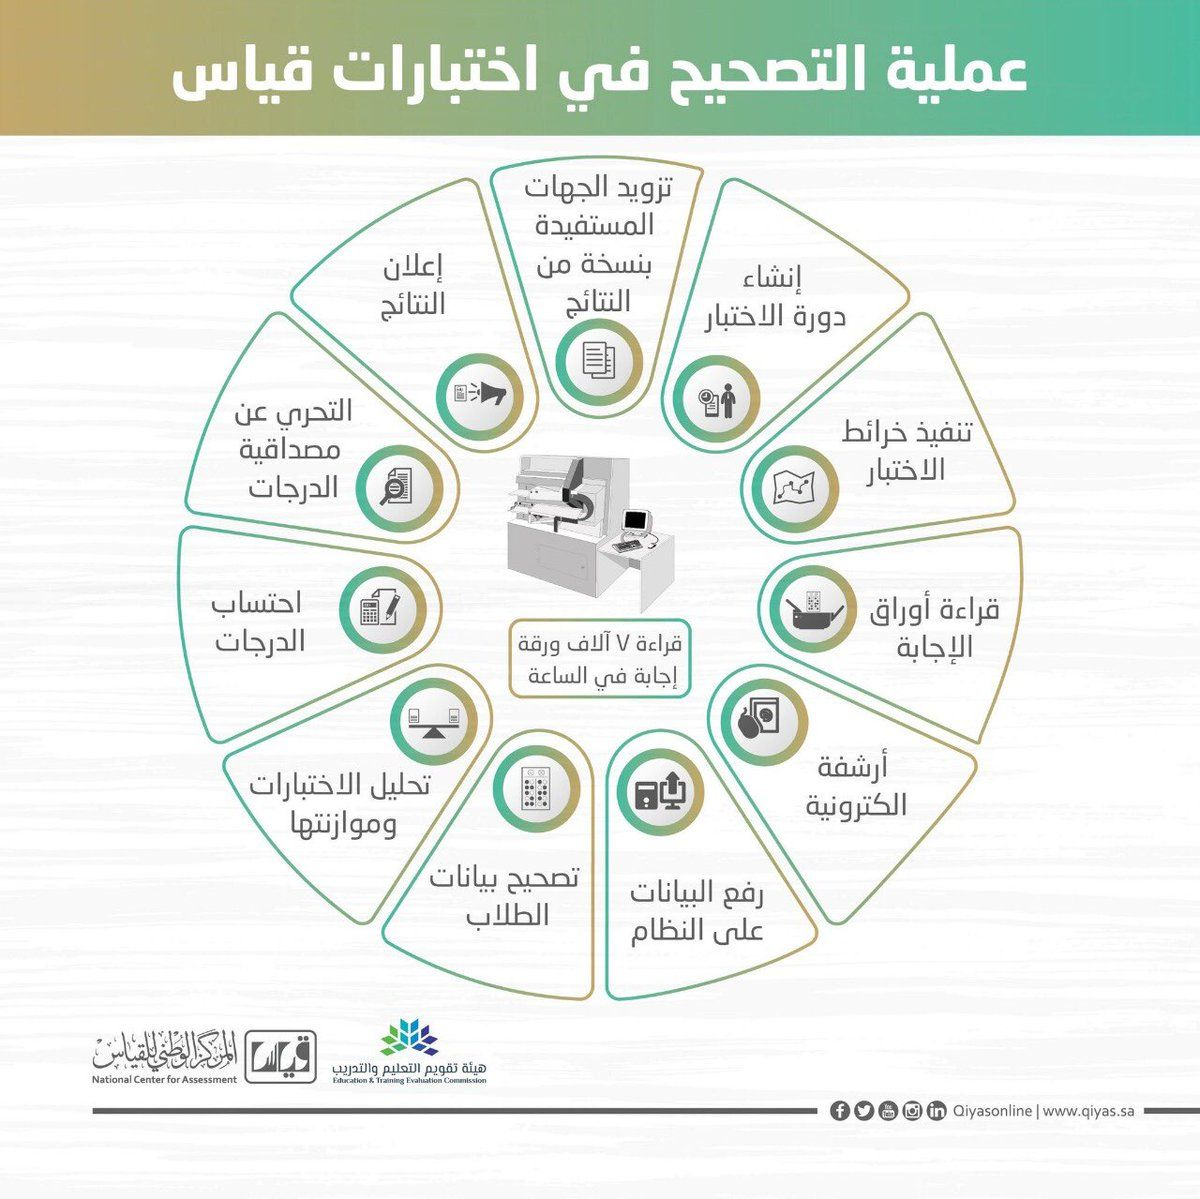 Official قياس المعرفي نتائج إختبارات القدرة المعرفية Now المركز الوطني للقياس Qiyas 1440 الأخبار العاجلة Map